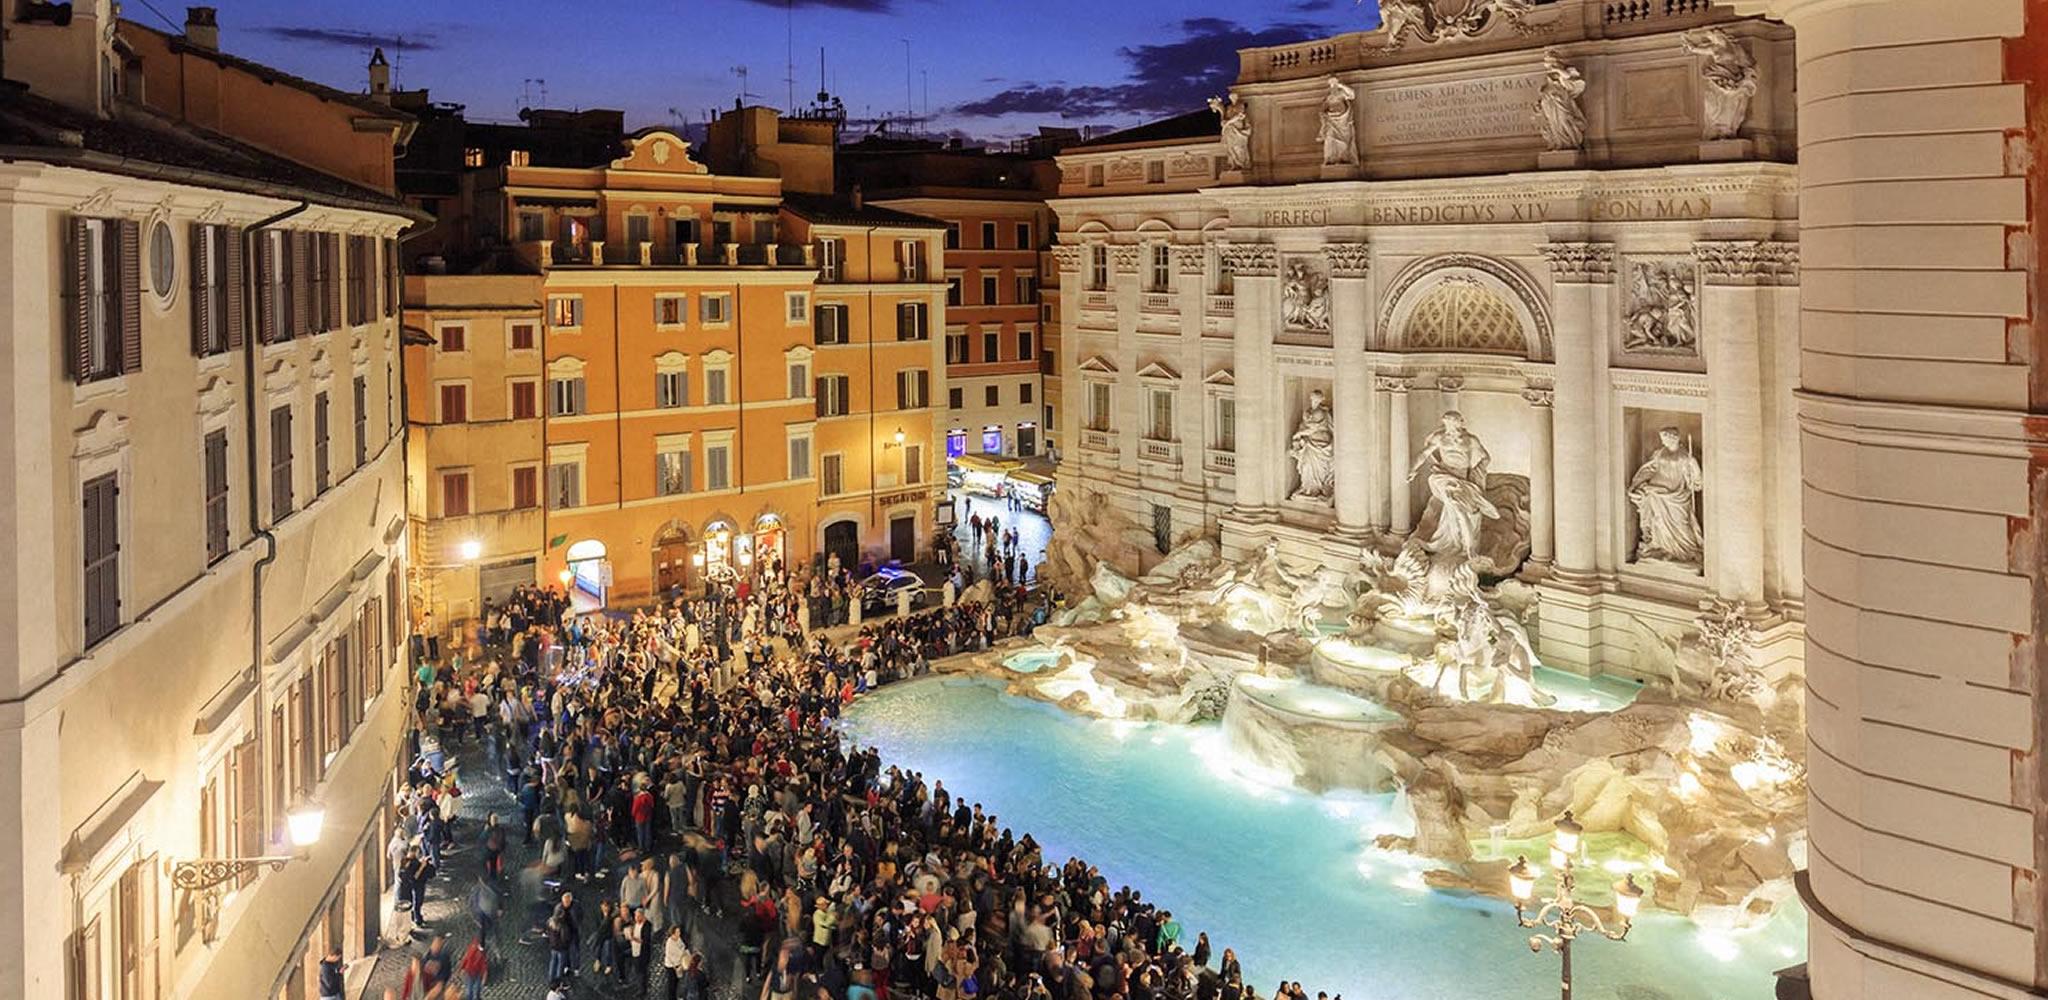 relais fontana di trevi rome オフィシャルサイト 3つ星ホテル